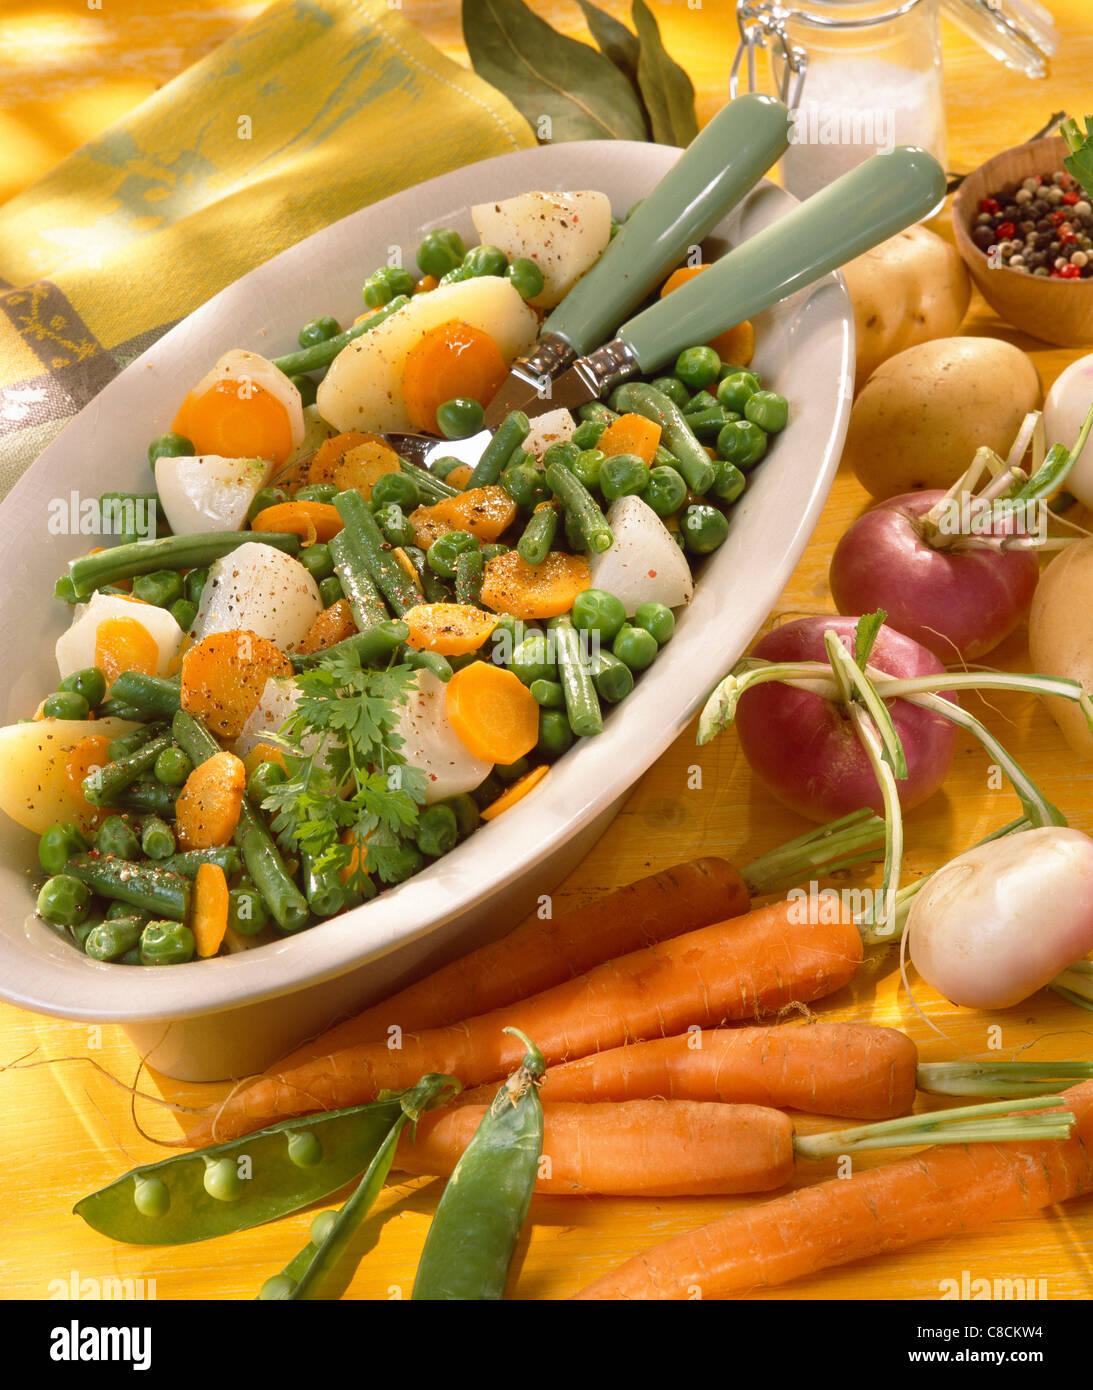 Jardiniere Mixed Vegetables Stock Photo 39617008 Alamy